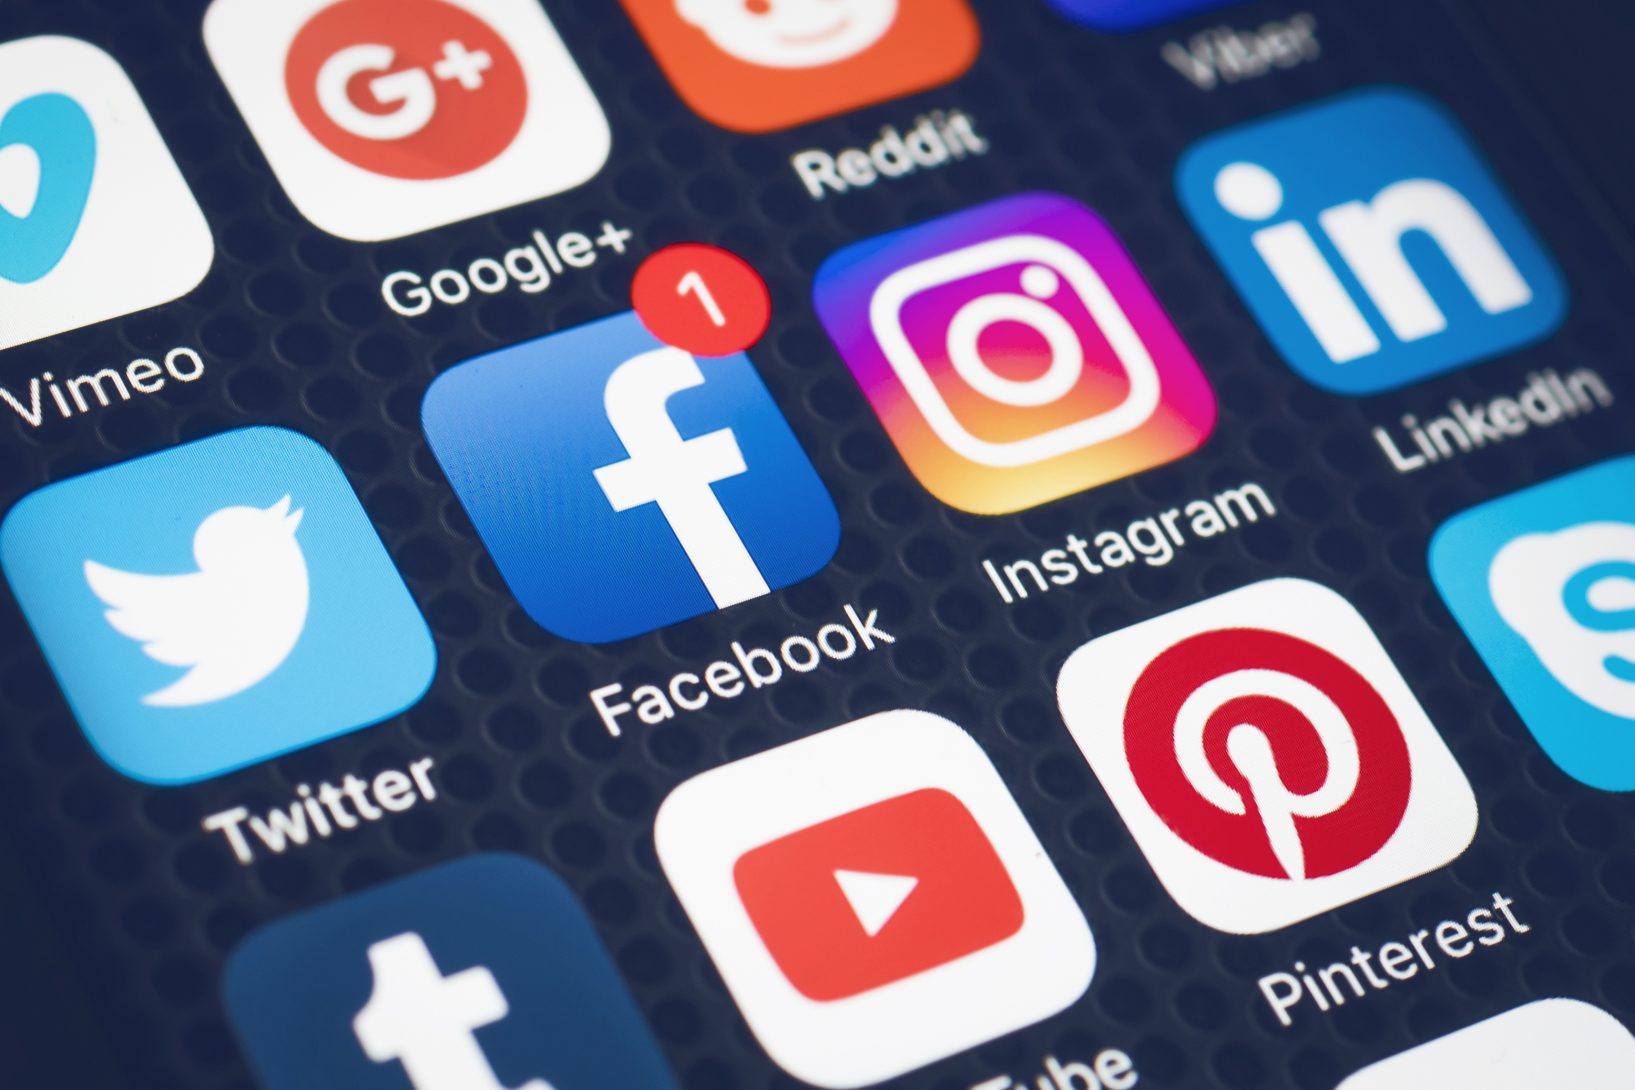 5 Best VPN Apps to Avoid Uganda's Social Media Tax